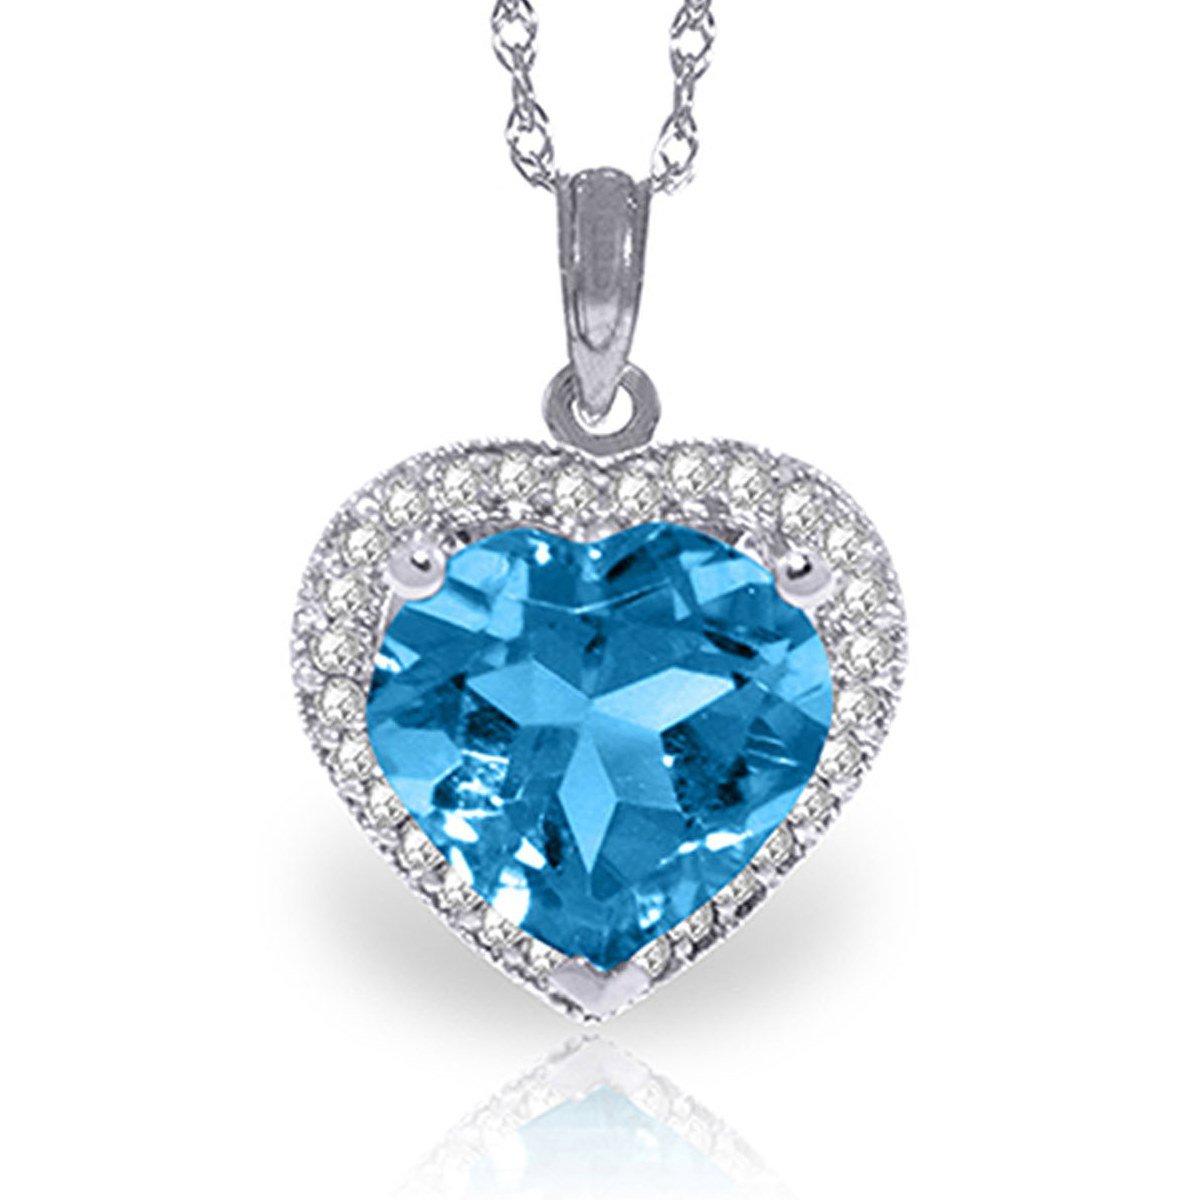 Heart Blue Topaz 29 Diamonds Pendant Necklace 14k White Gold 4951-W